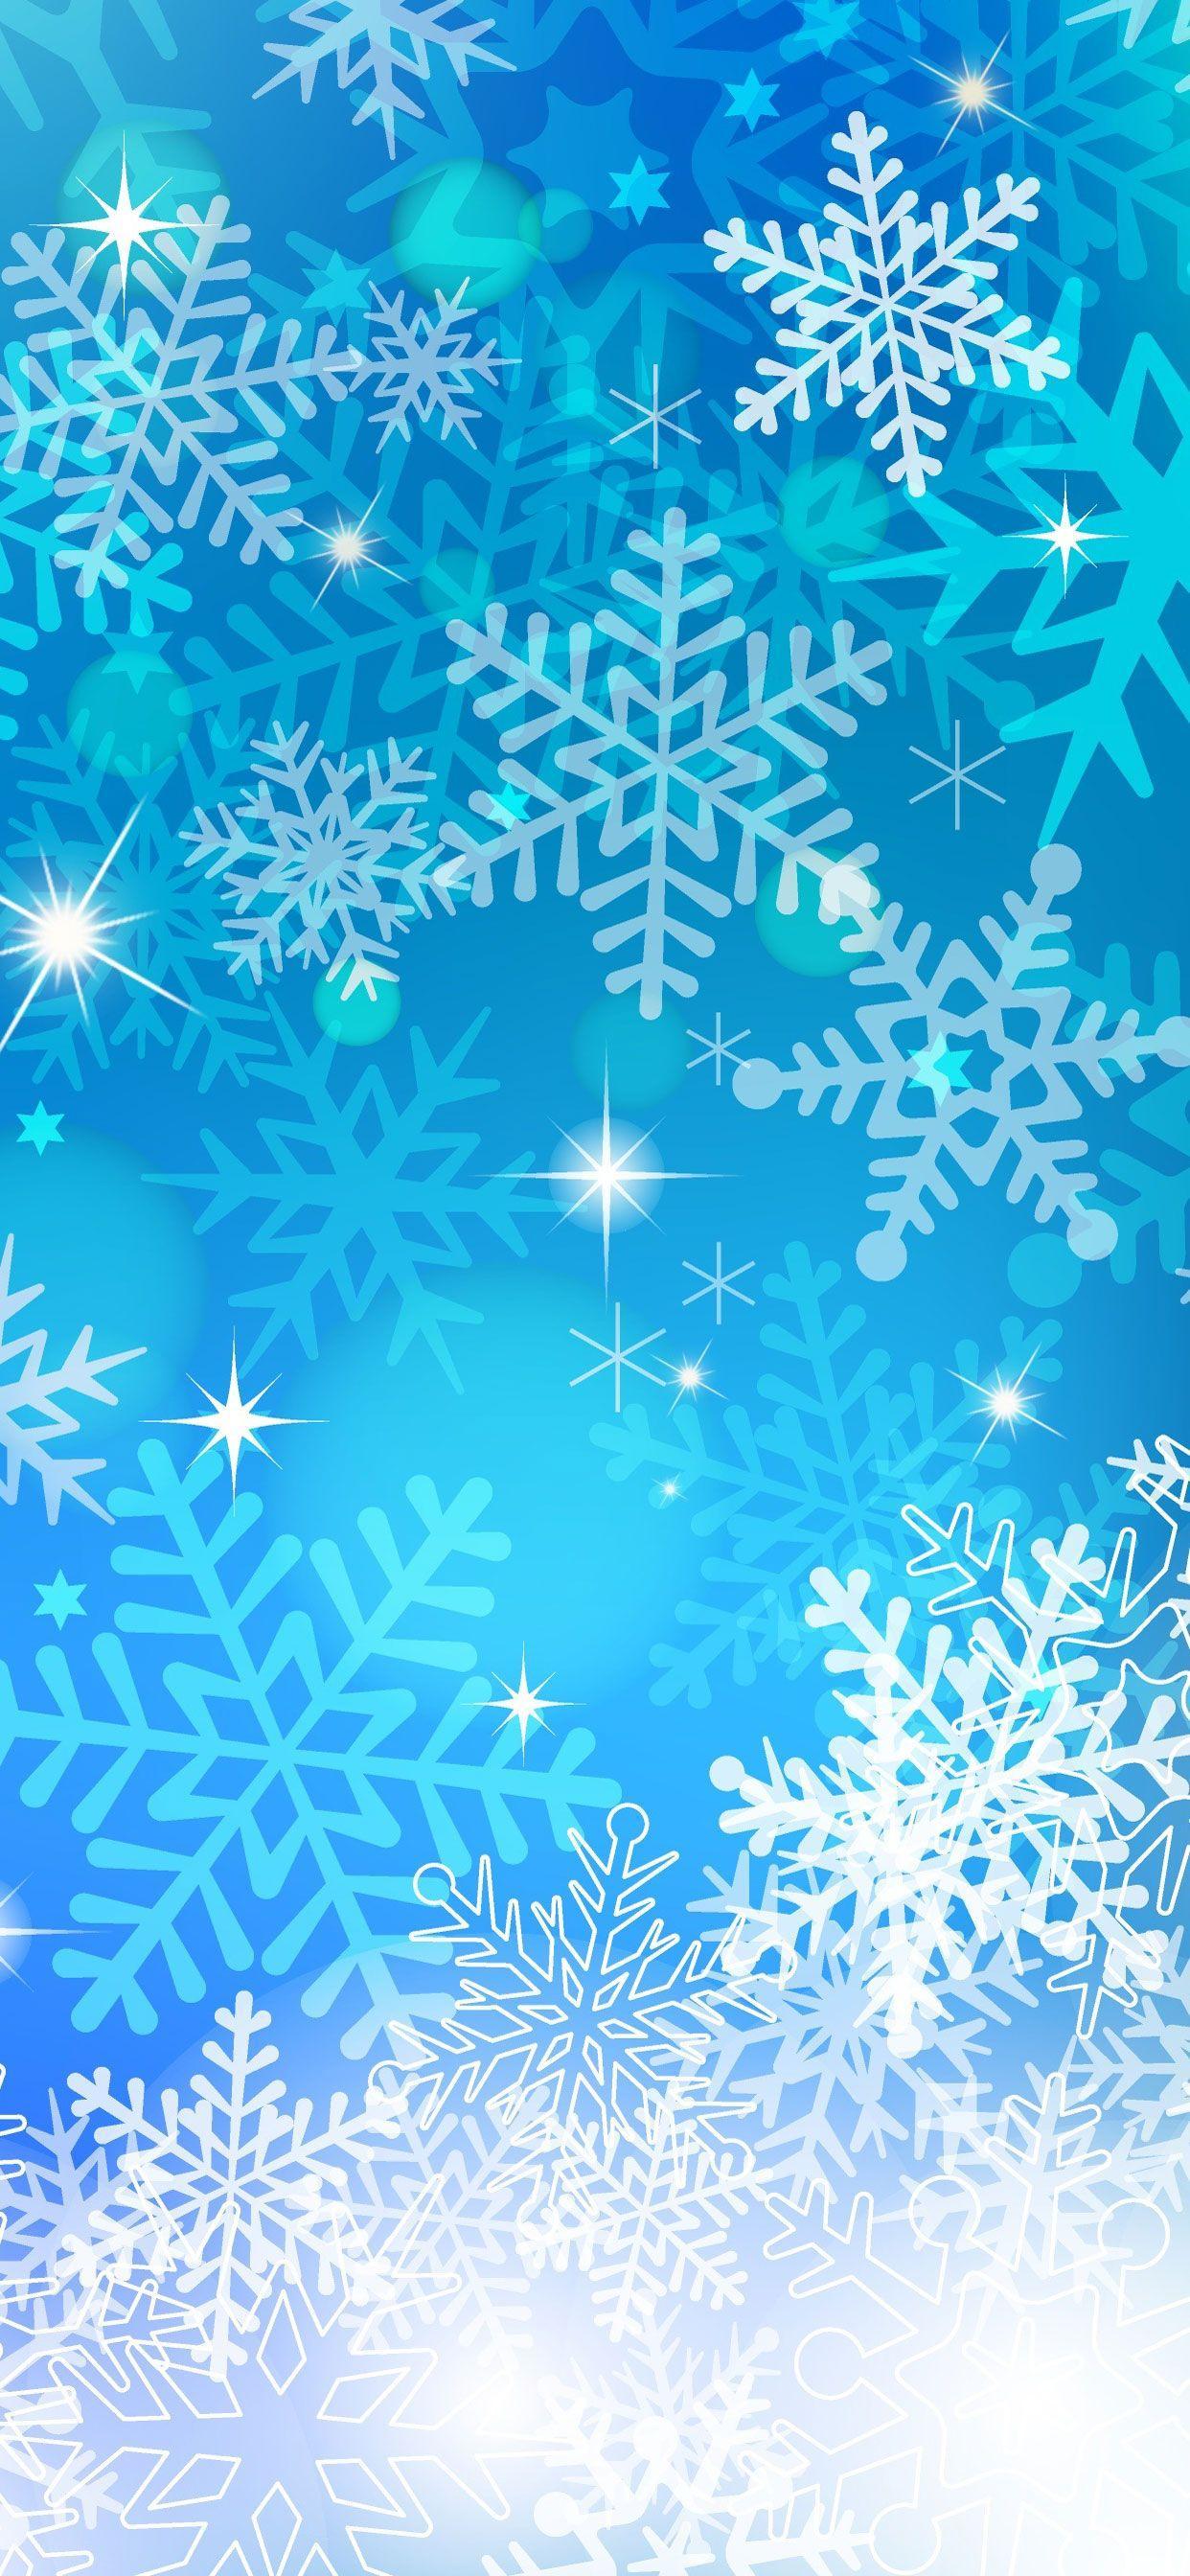 Snowflake Iphone Wallpapers Top Free Snowflake Iphone